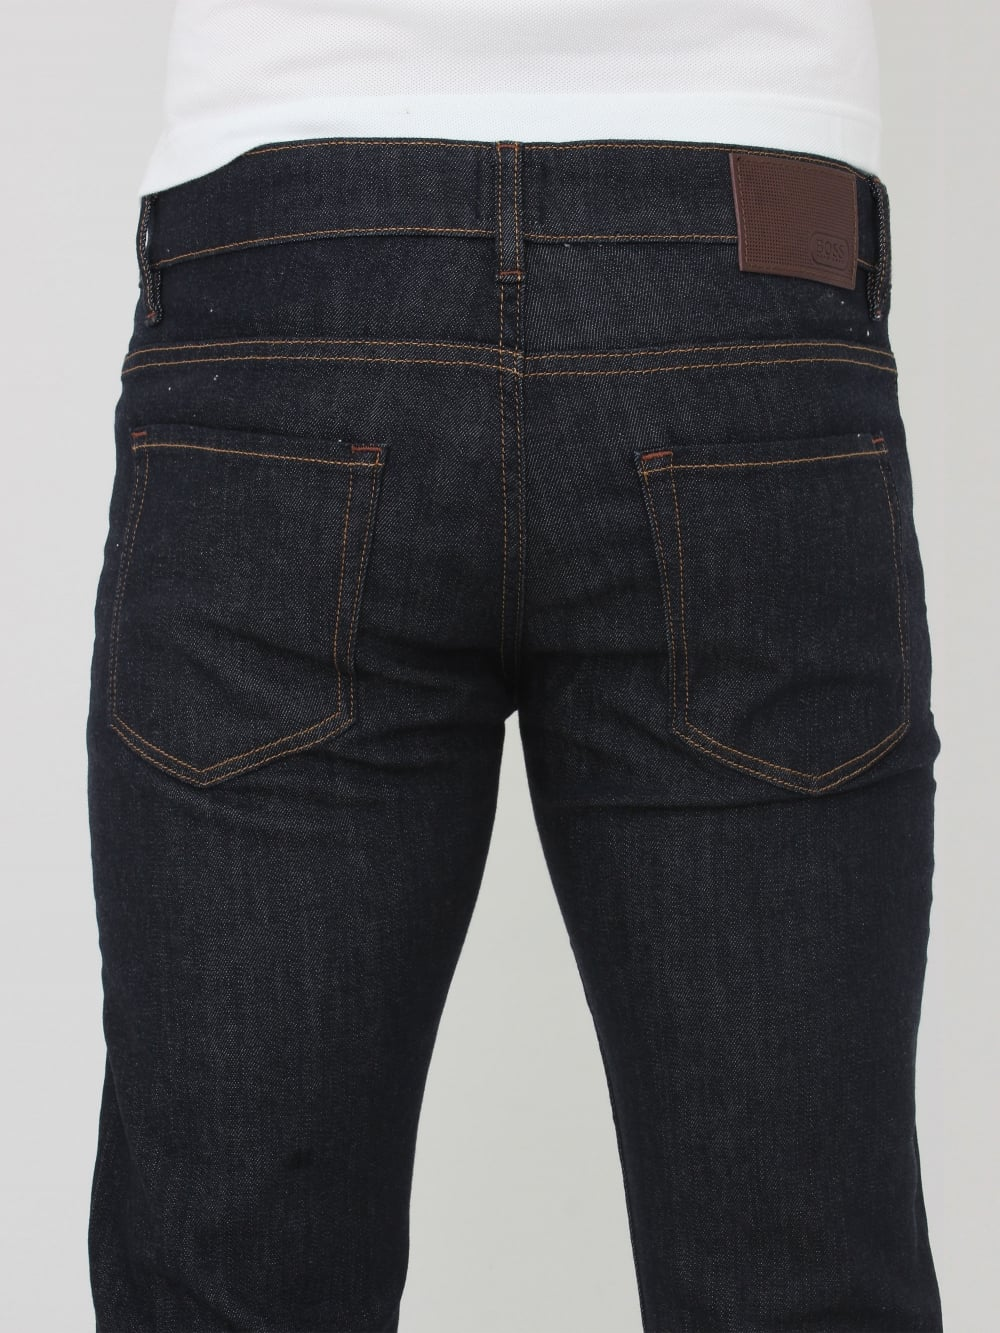 174f009522ad1 HUGO BOSS - BOSS Green Delaware 1 Slim Fit Jeans In Dark Blue ...